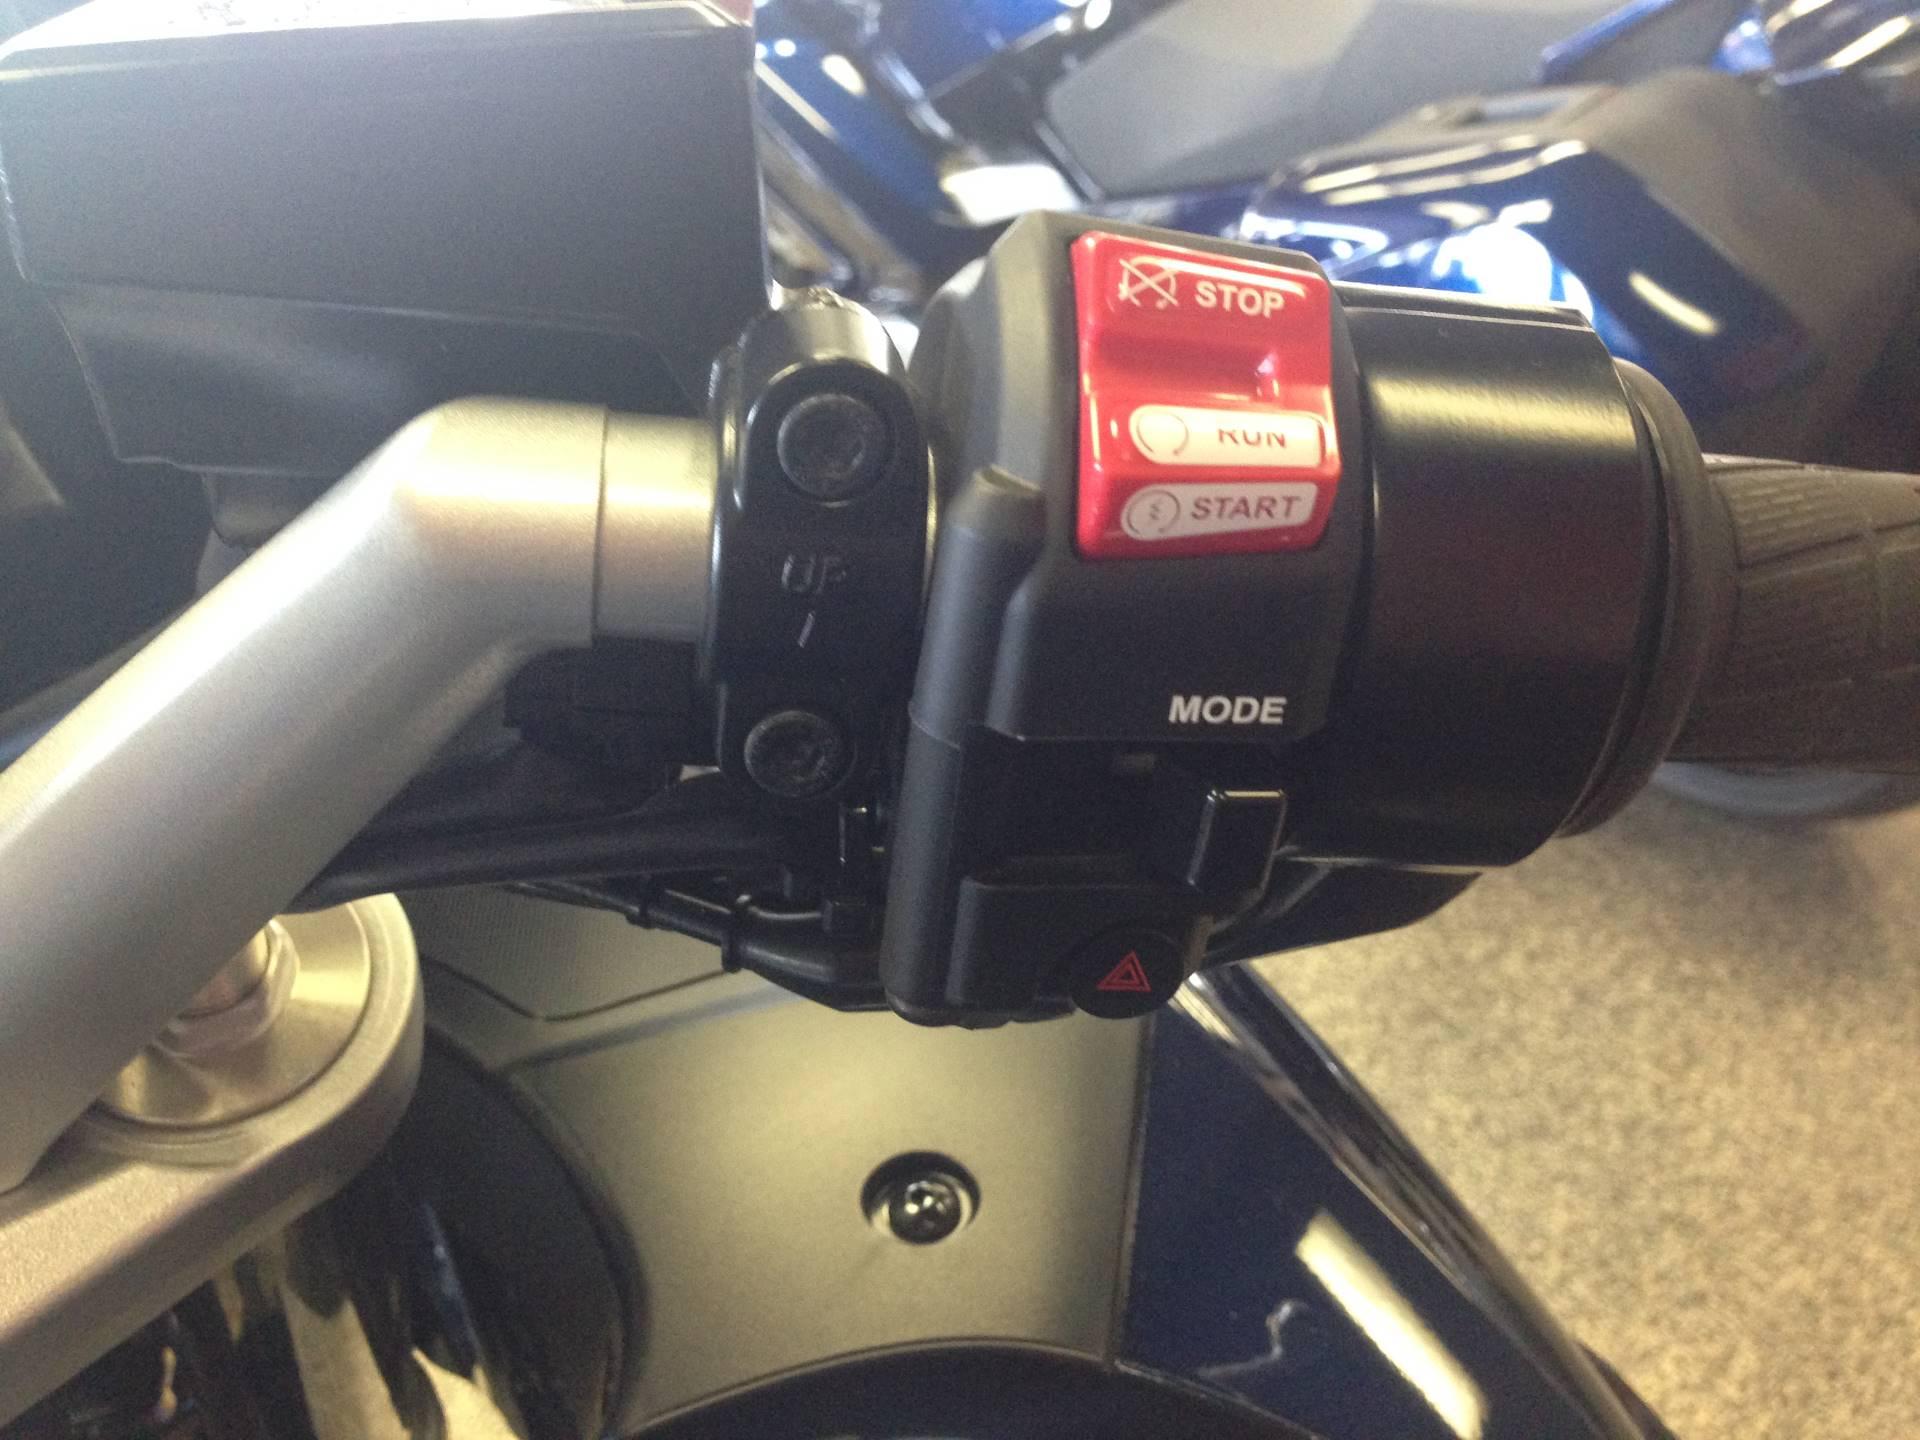 2016 Yamaha FJR1300A 10